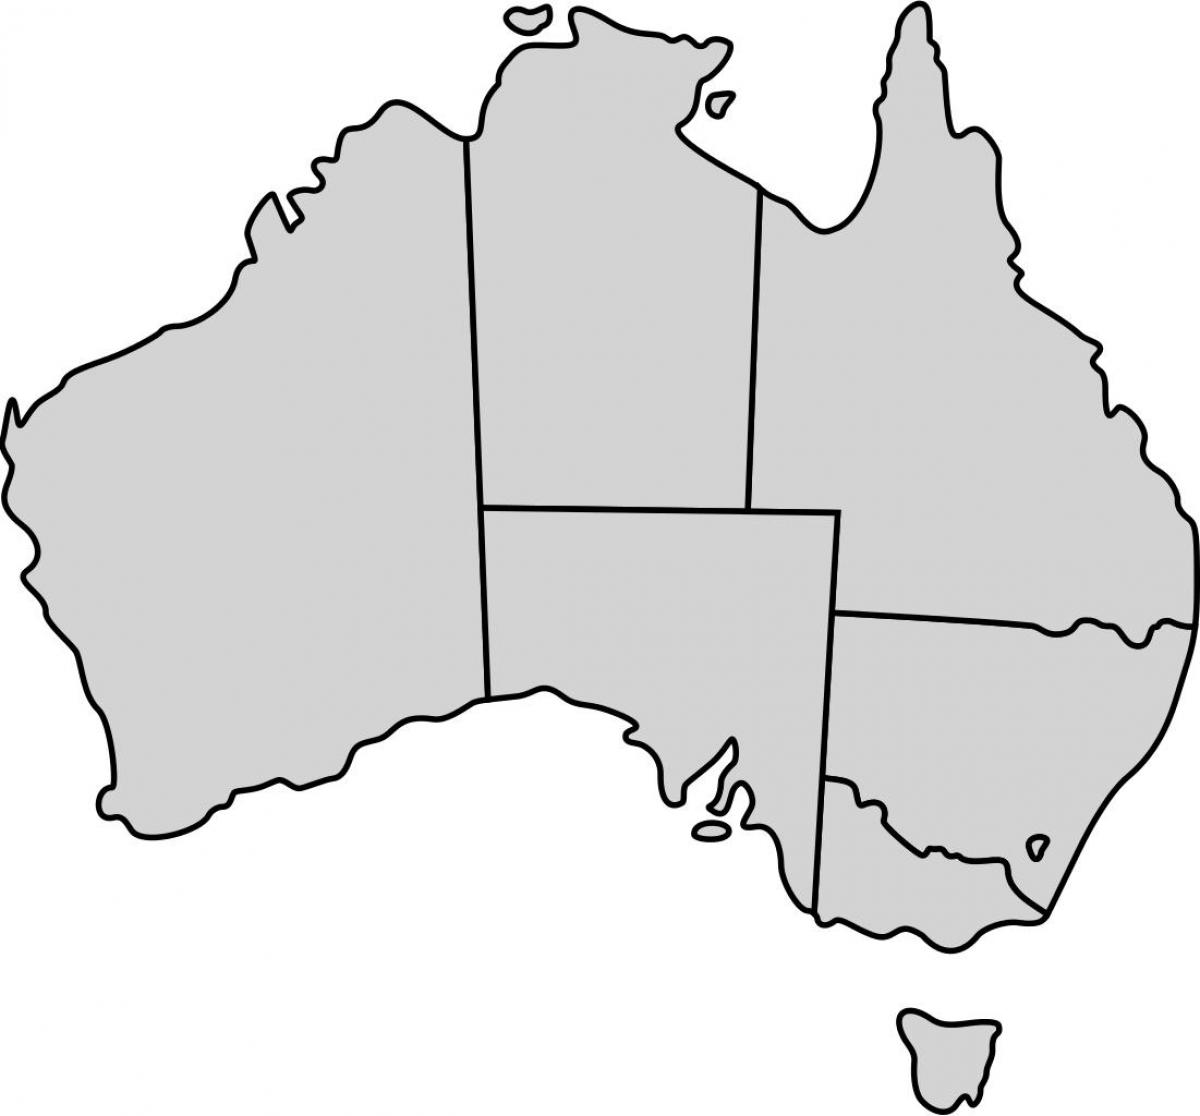 Map Of Australia Blank.Blank Australia Map Simple Map Of Australia Australia And New